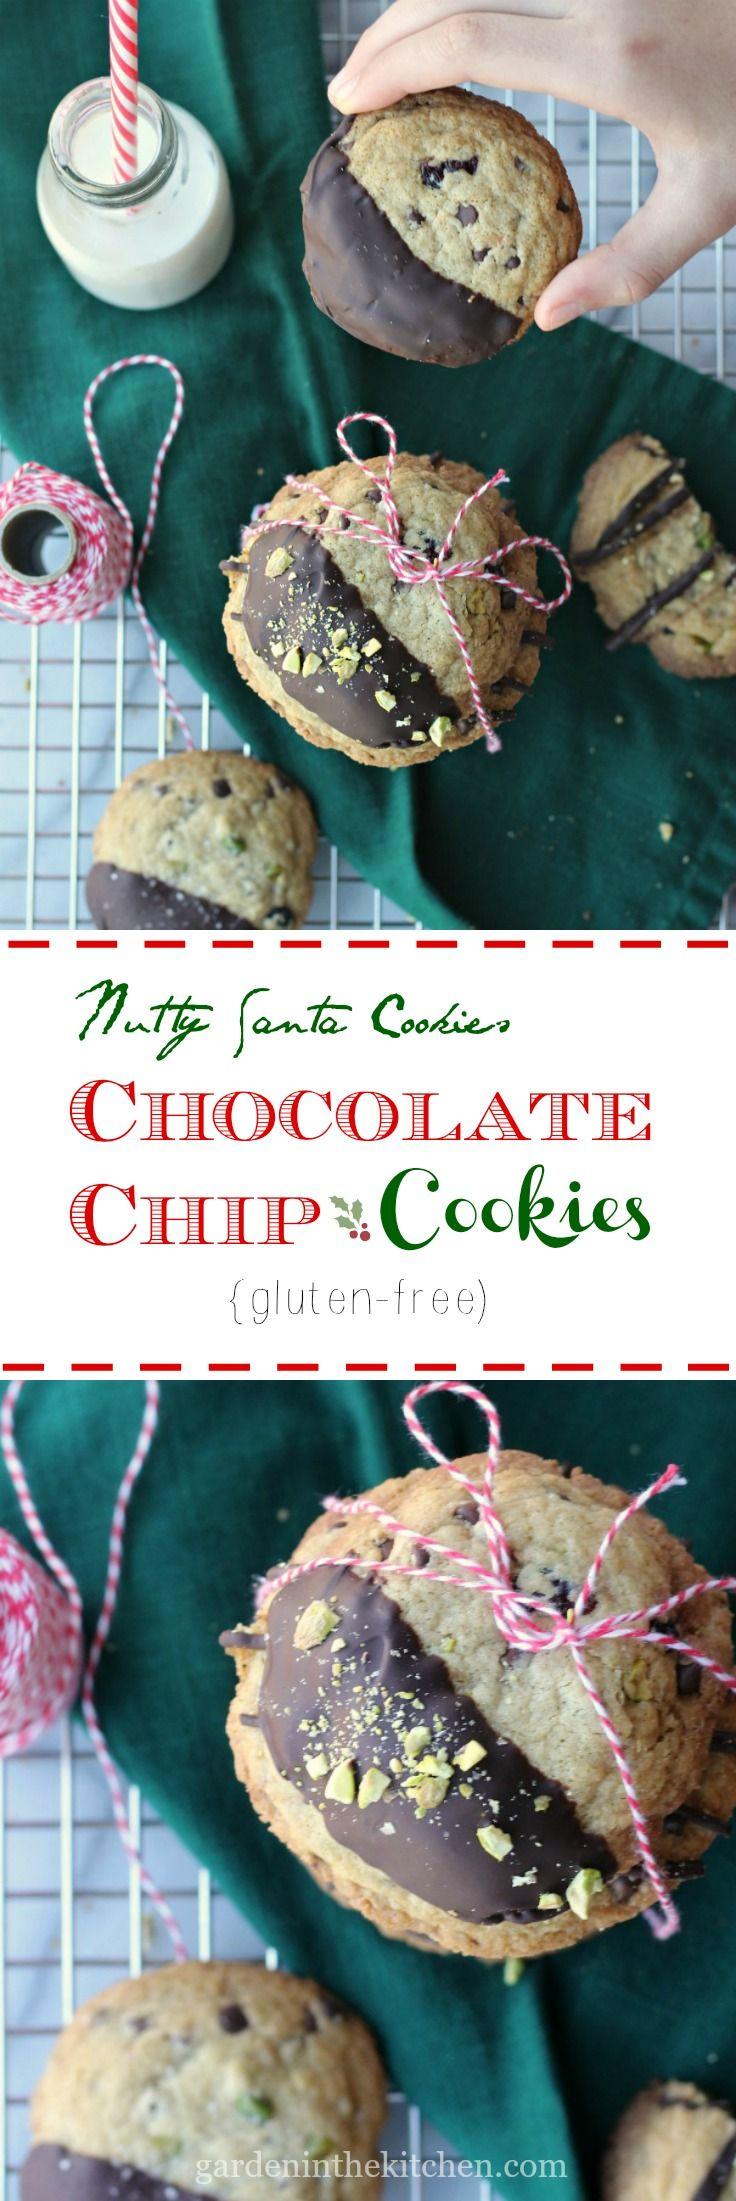 Nutty Chocolate Chip Cookies (Gluten-free) | @BobsRedMill #BobsHolidayCheer